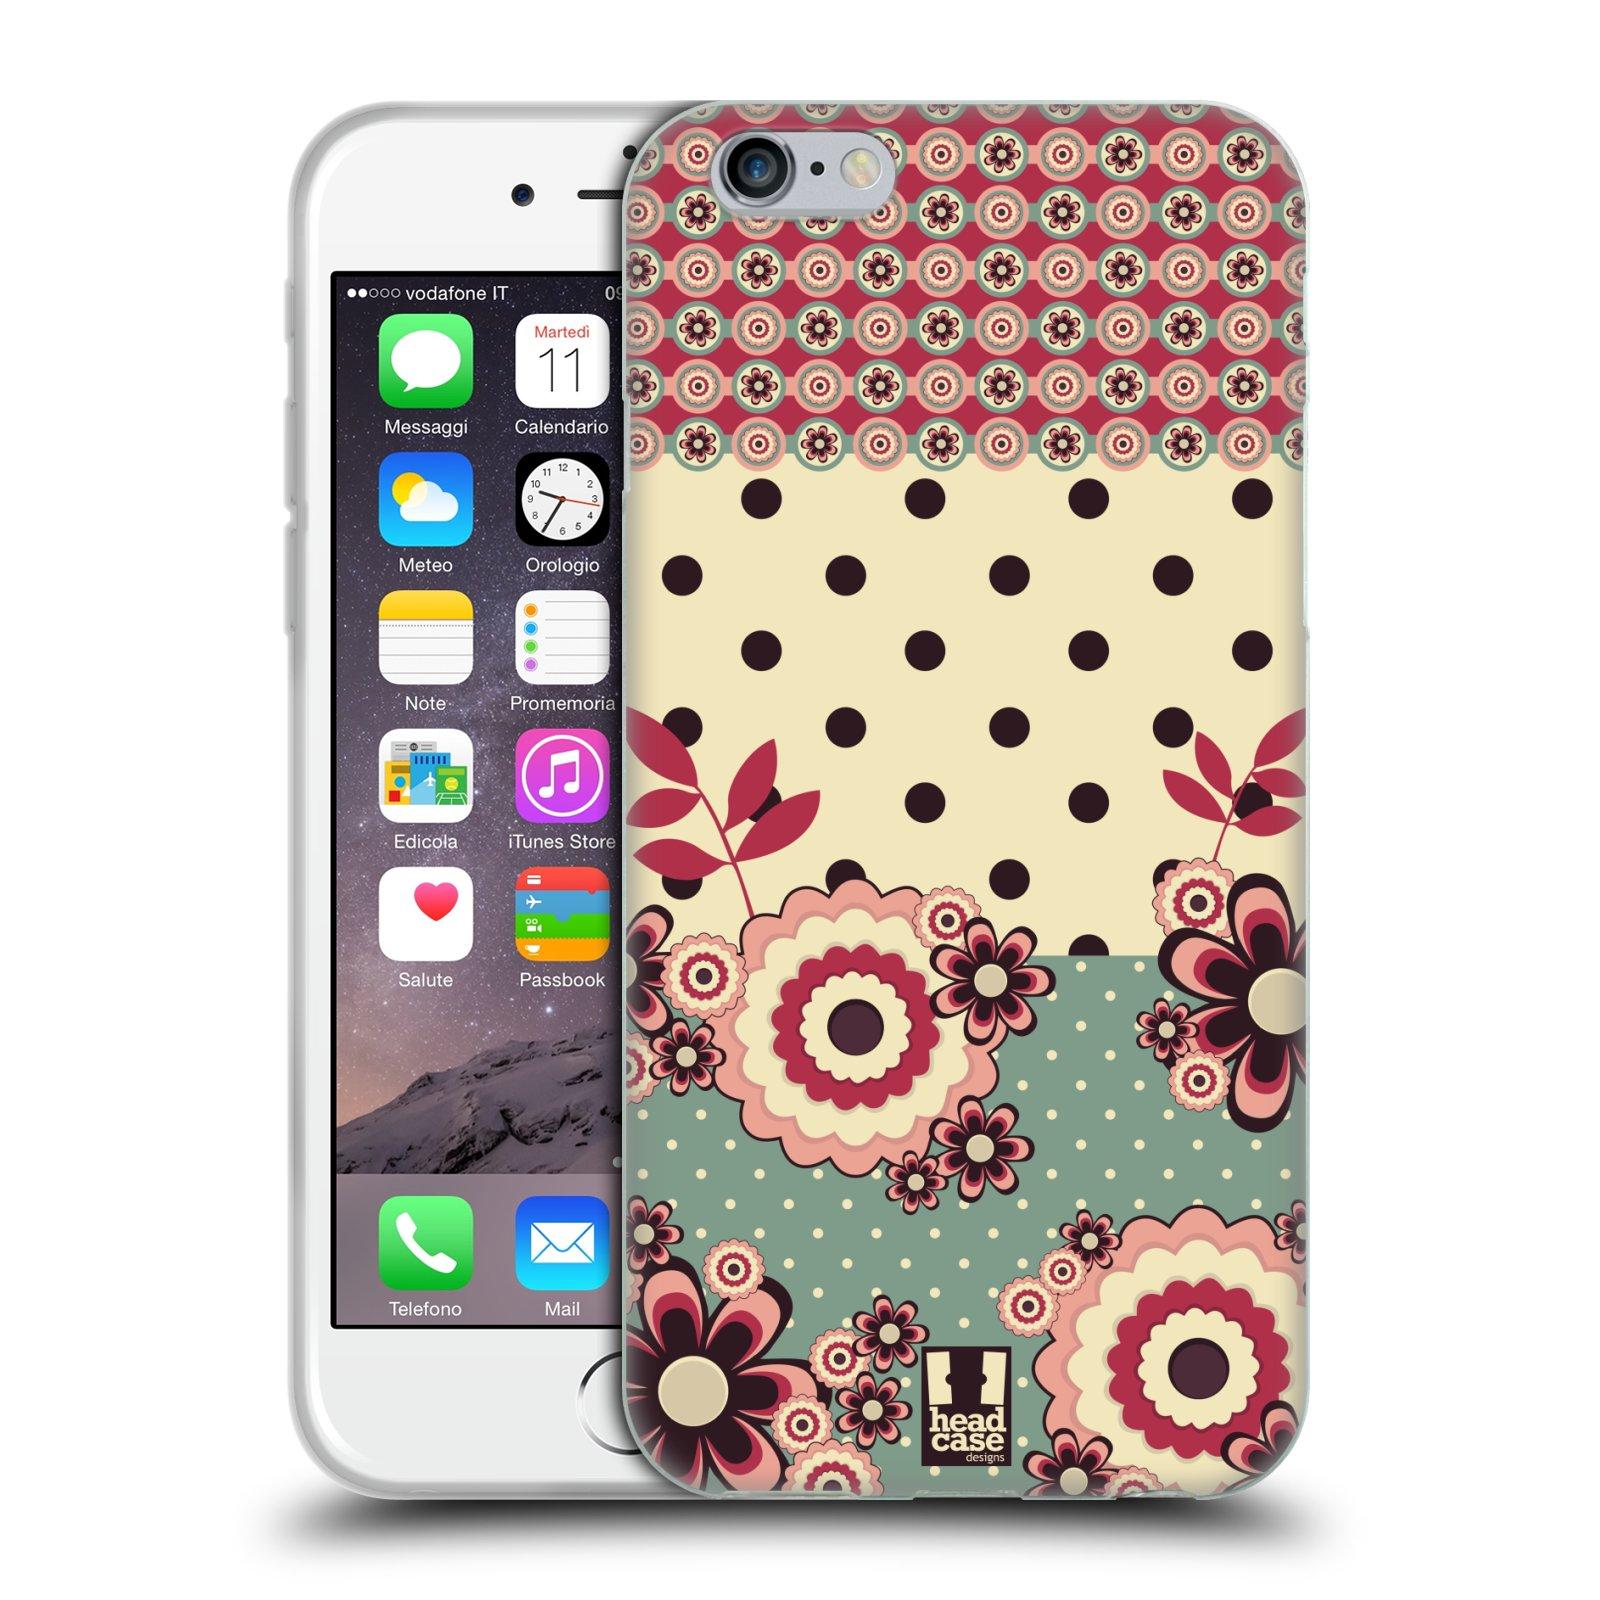 Silikonové pouzdro na mobil Apple iPhone 6 a 6S HEAD CASE KVÍTKA PINK CREAM (Silikonový kryt či obal na mobilní telefon Apple iPhone 6 a 6S)